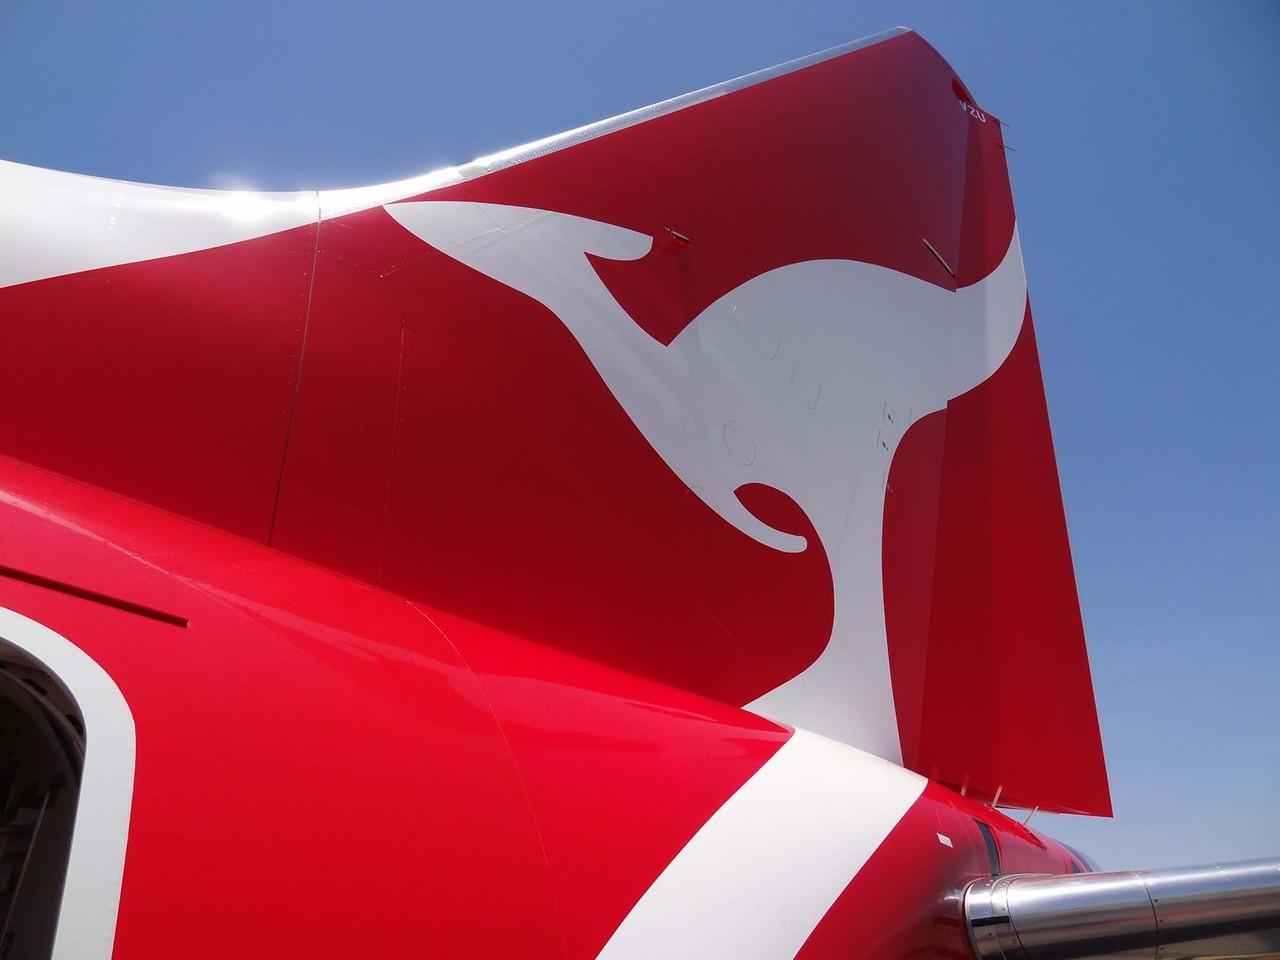 3. Etappe - Flug  von Perth nach Alice Springs